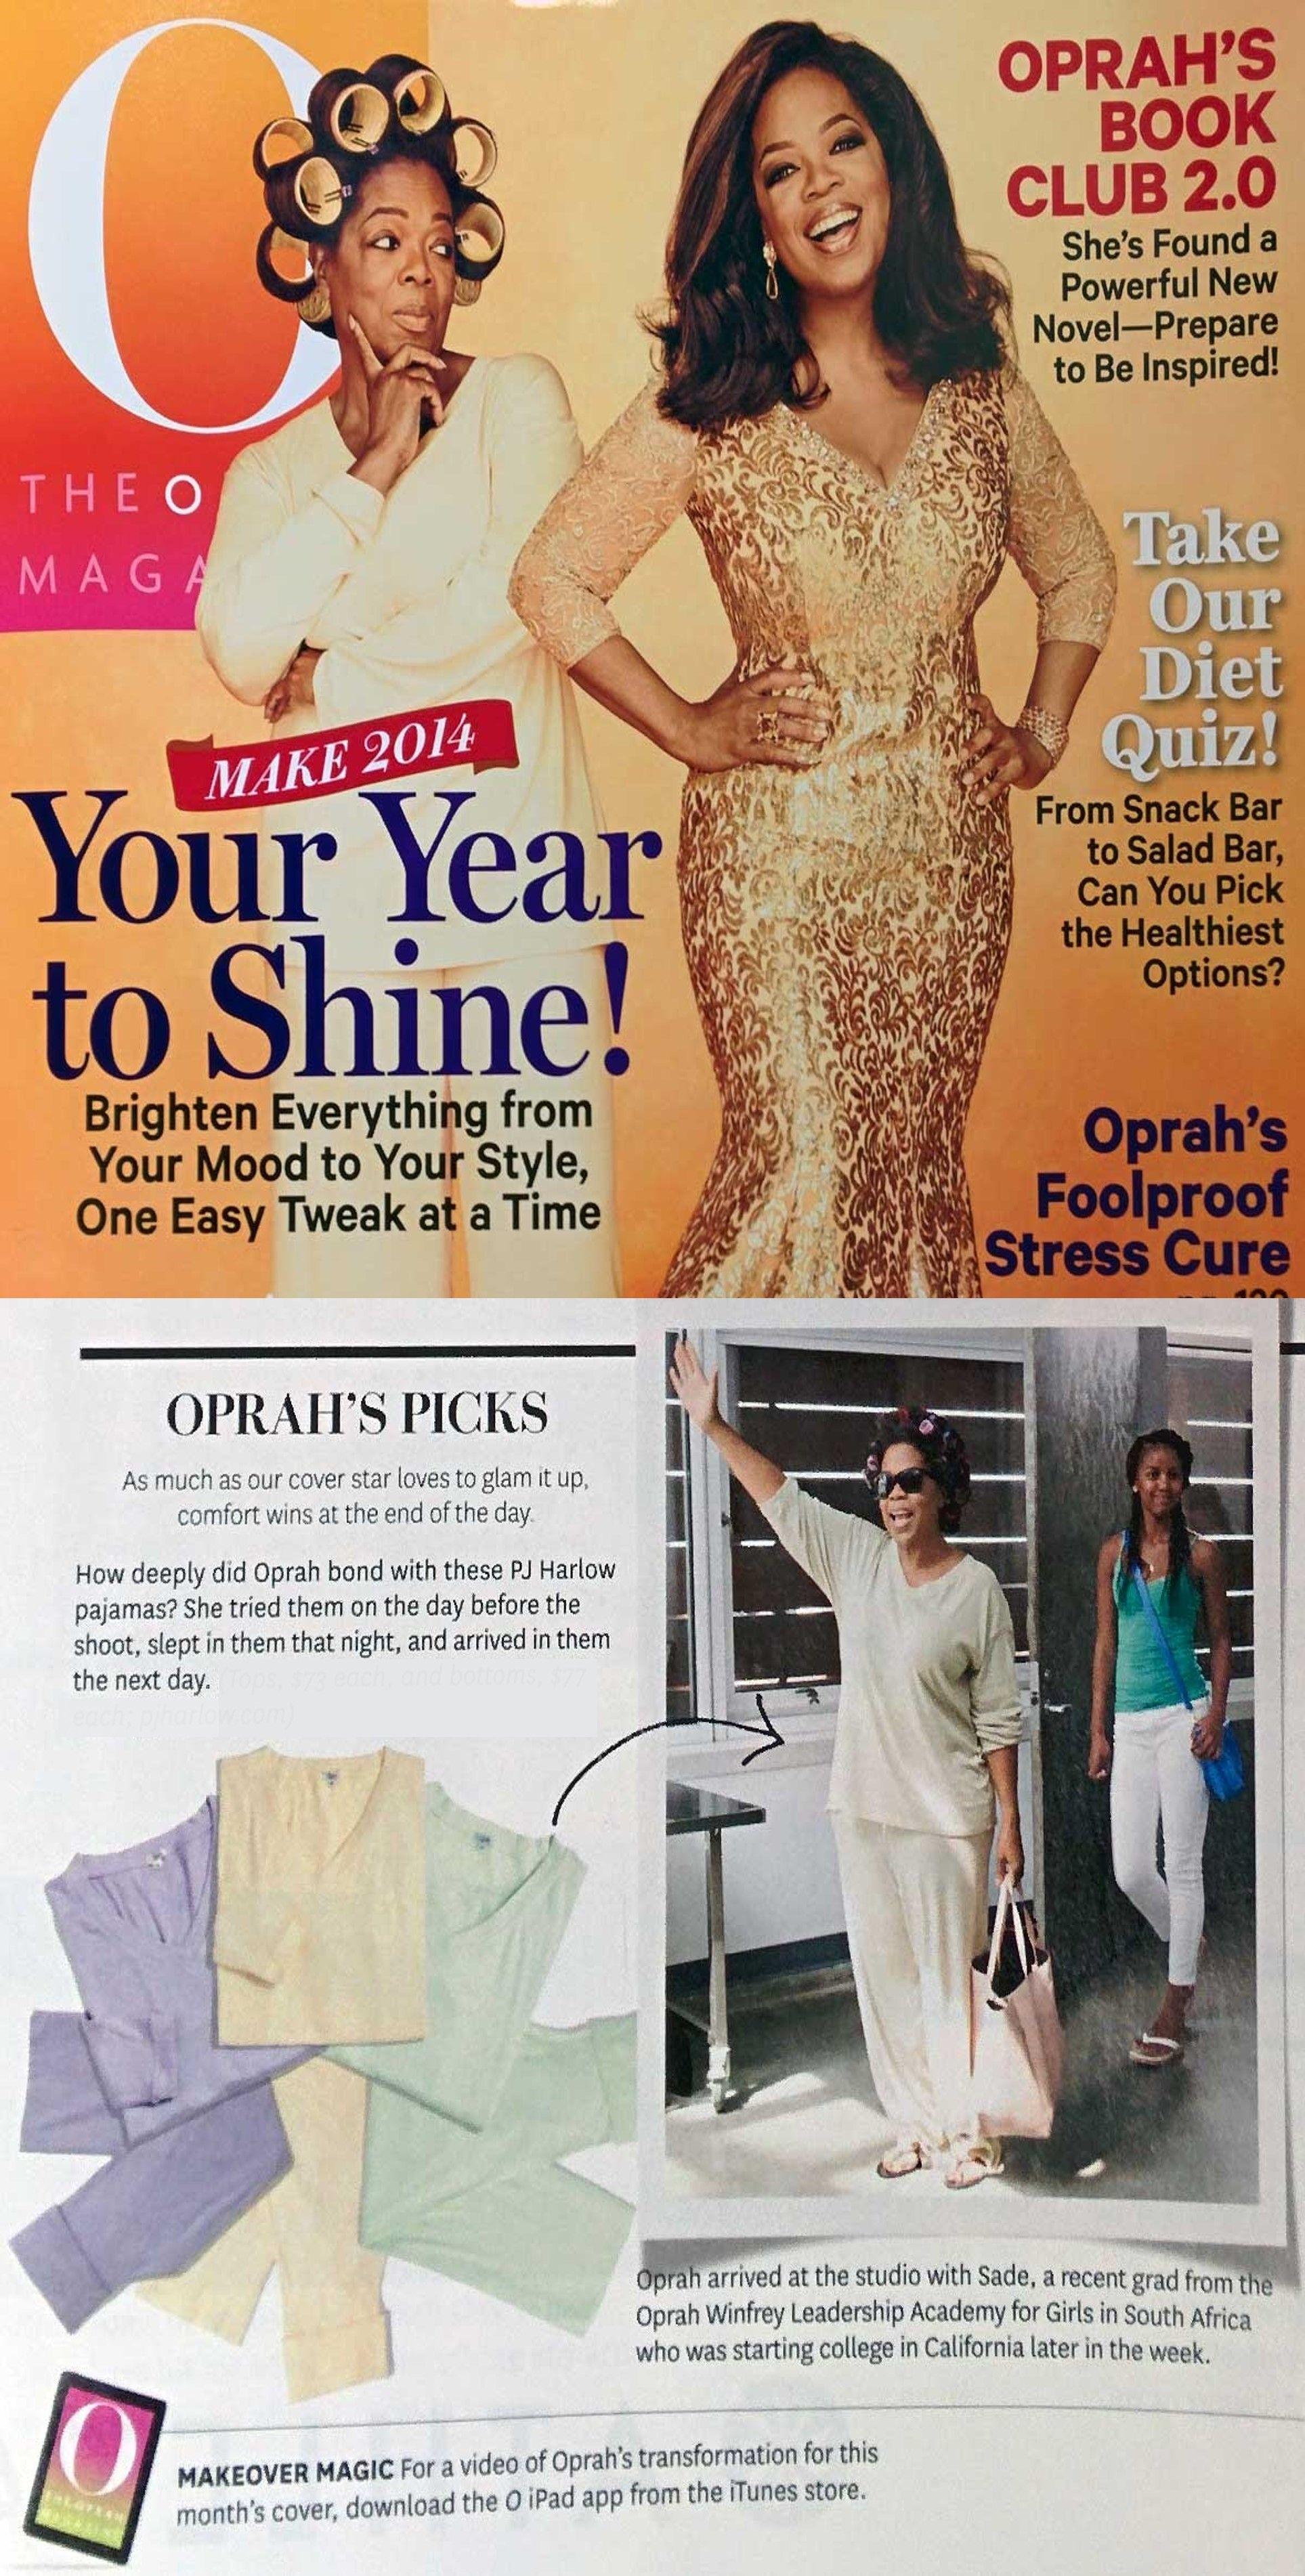 532d5c6b89 Oprah s Favorite Things.. PJ Harlow Pajamas